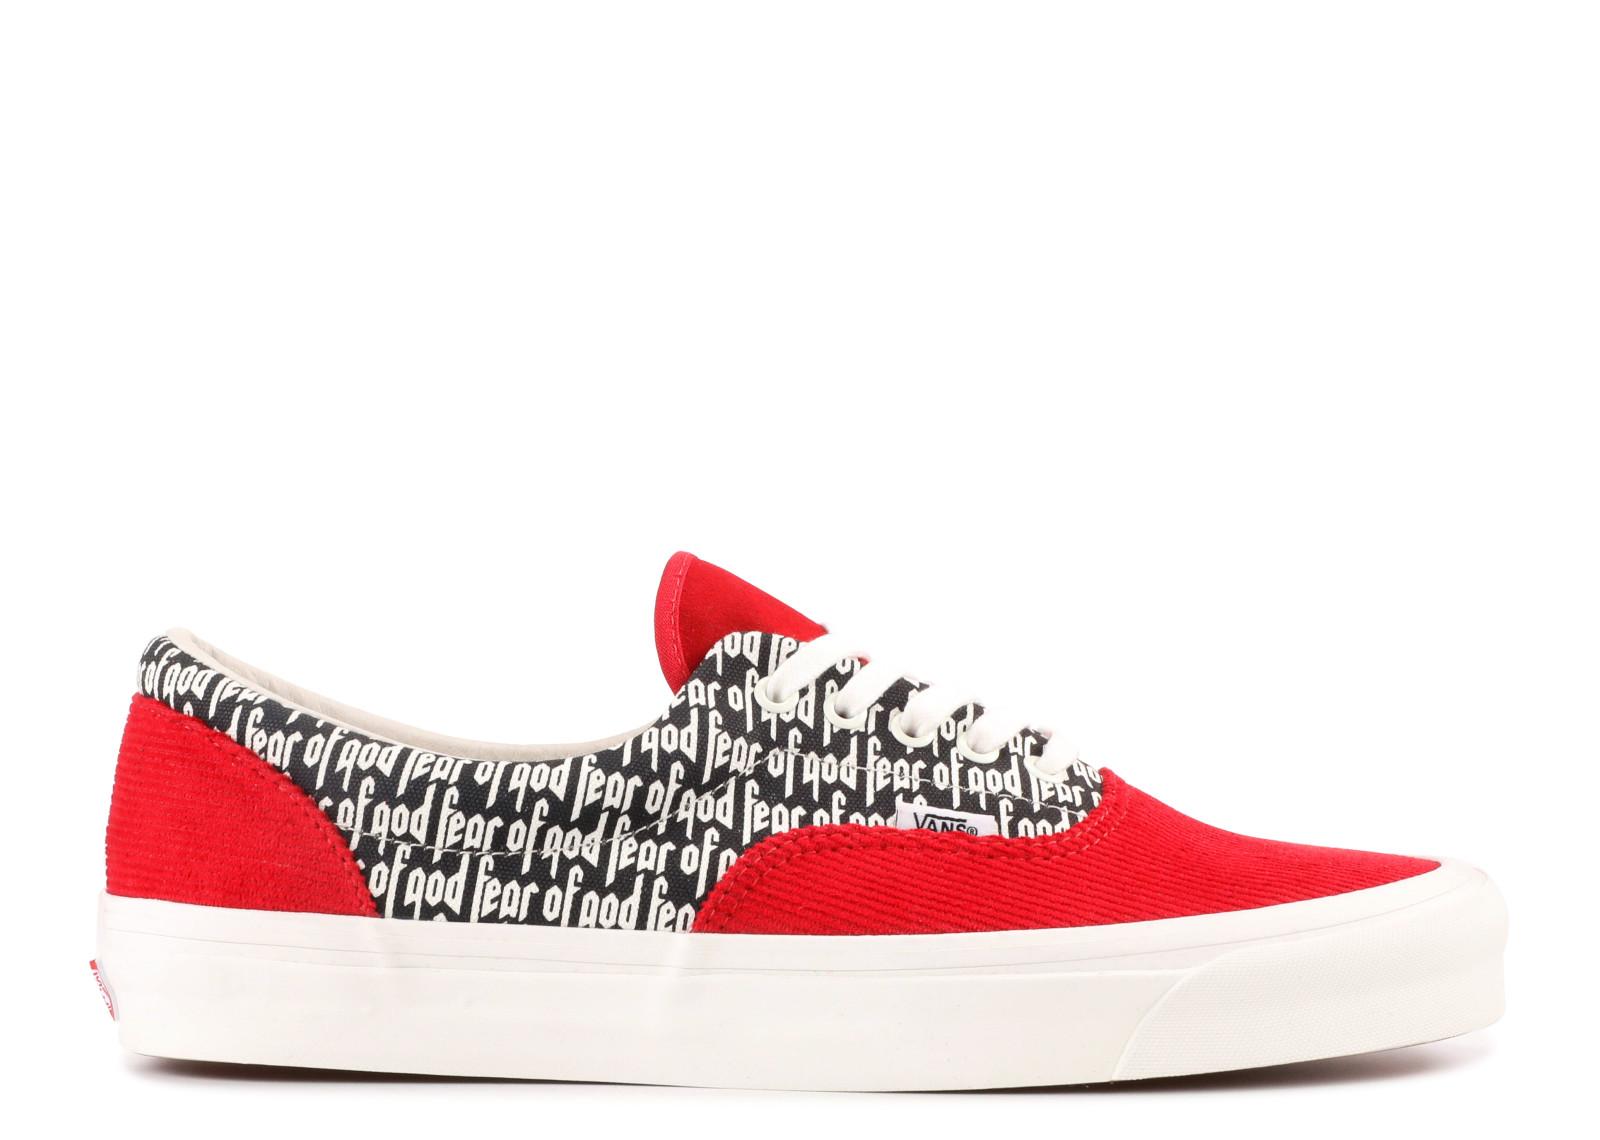 cd9b4f1743 Kick Avenue - Authentic Sneakers